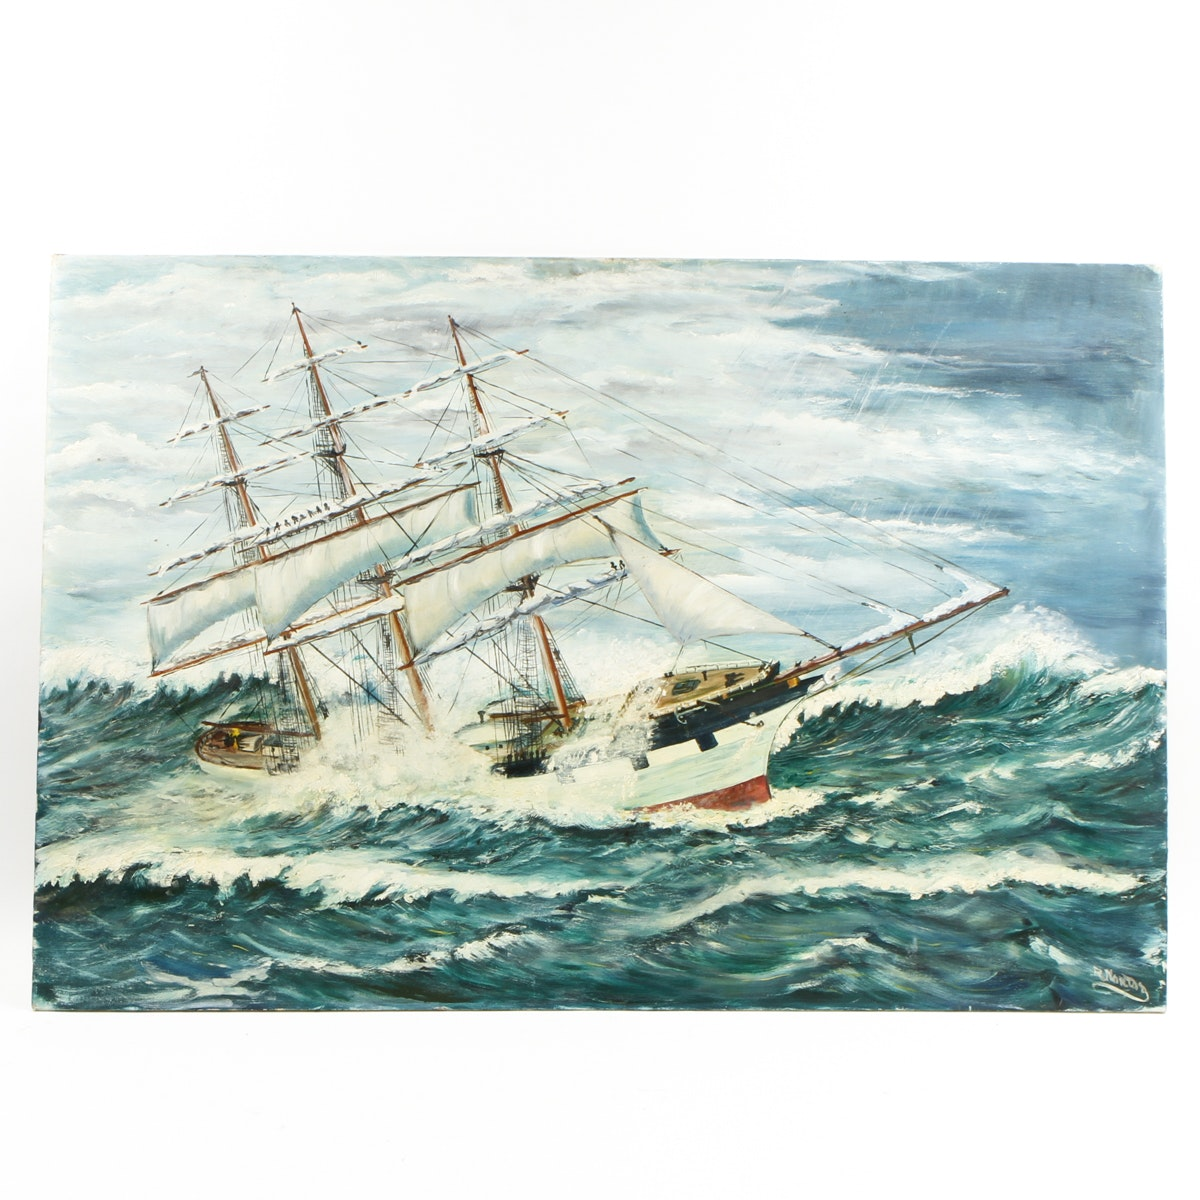 Painting of a Ship at Sea